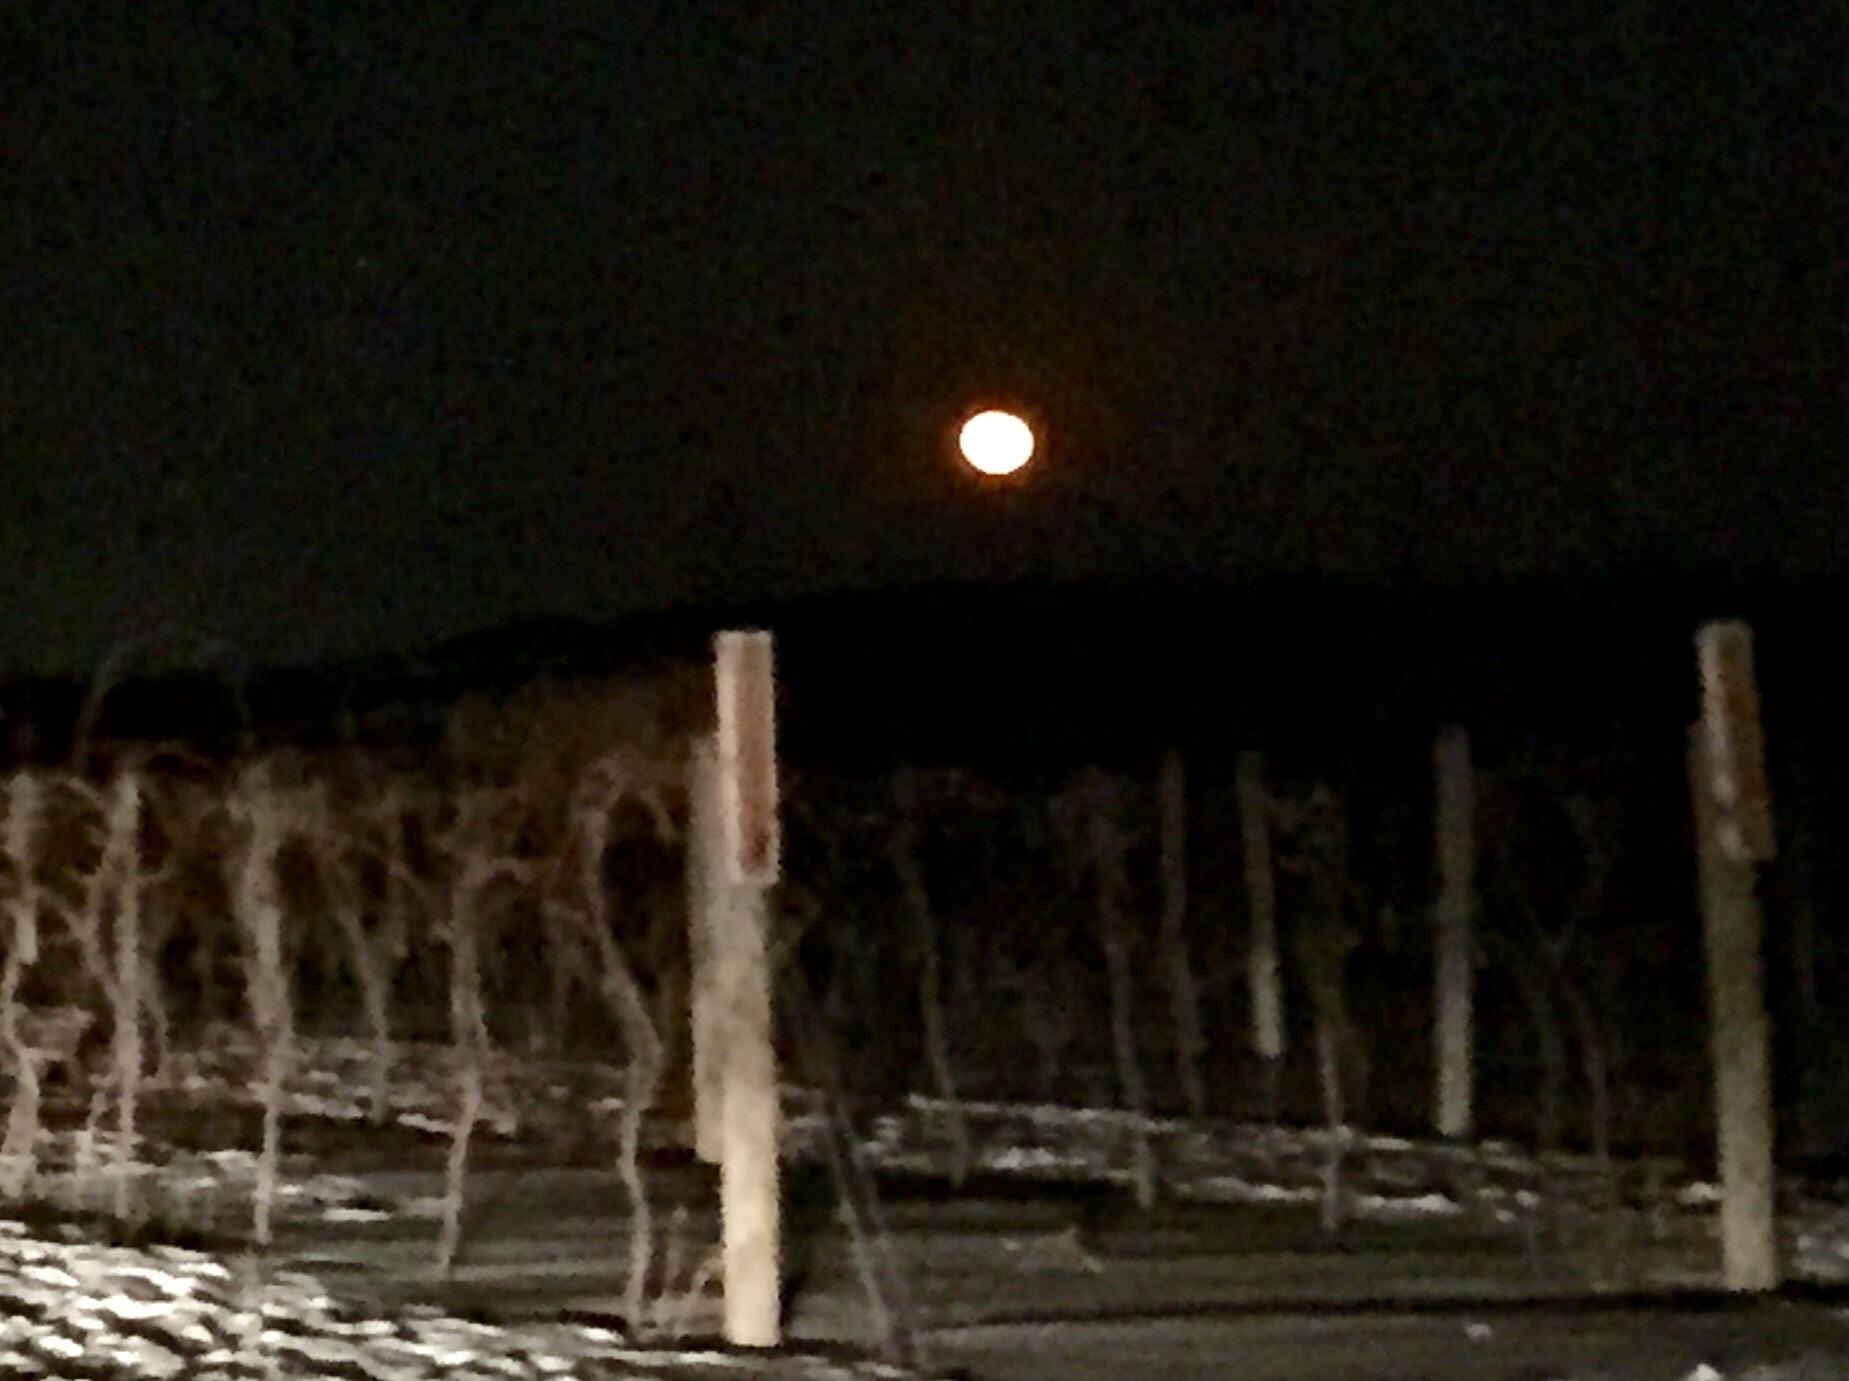 The last full moon Winter of 2015